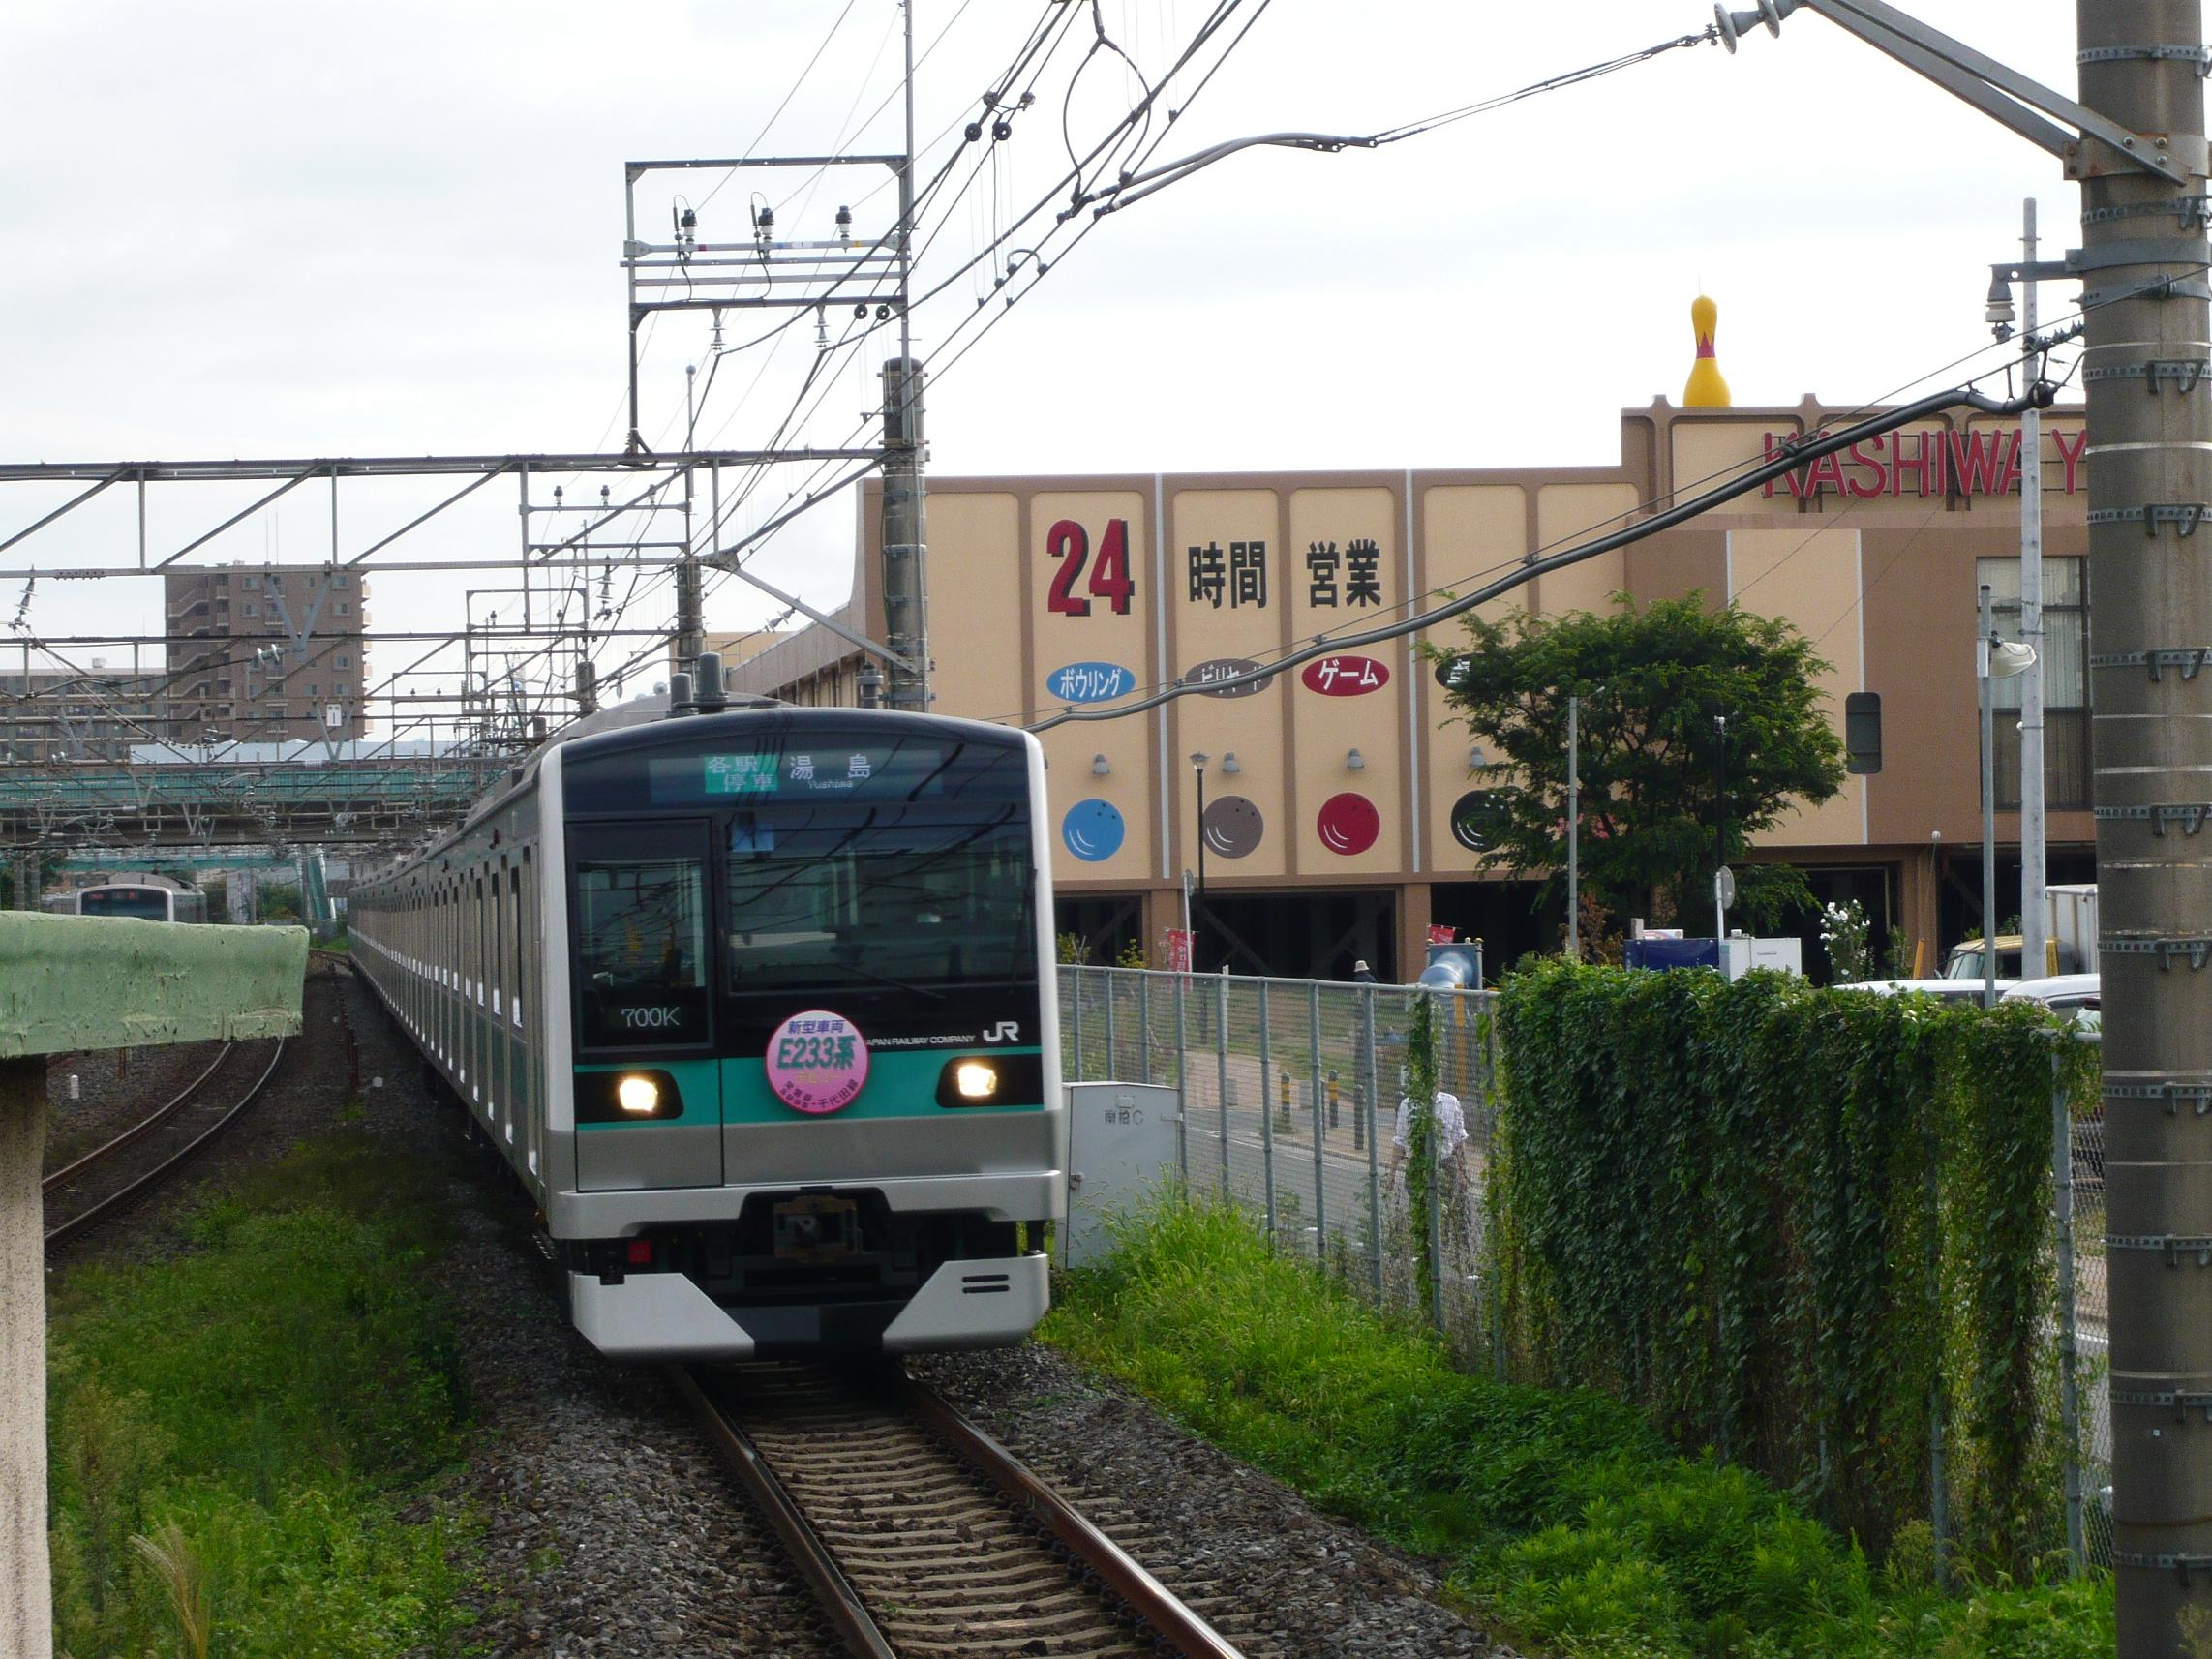 P1010687-2.JPG